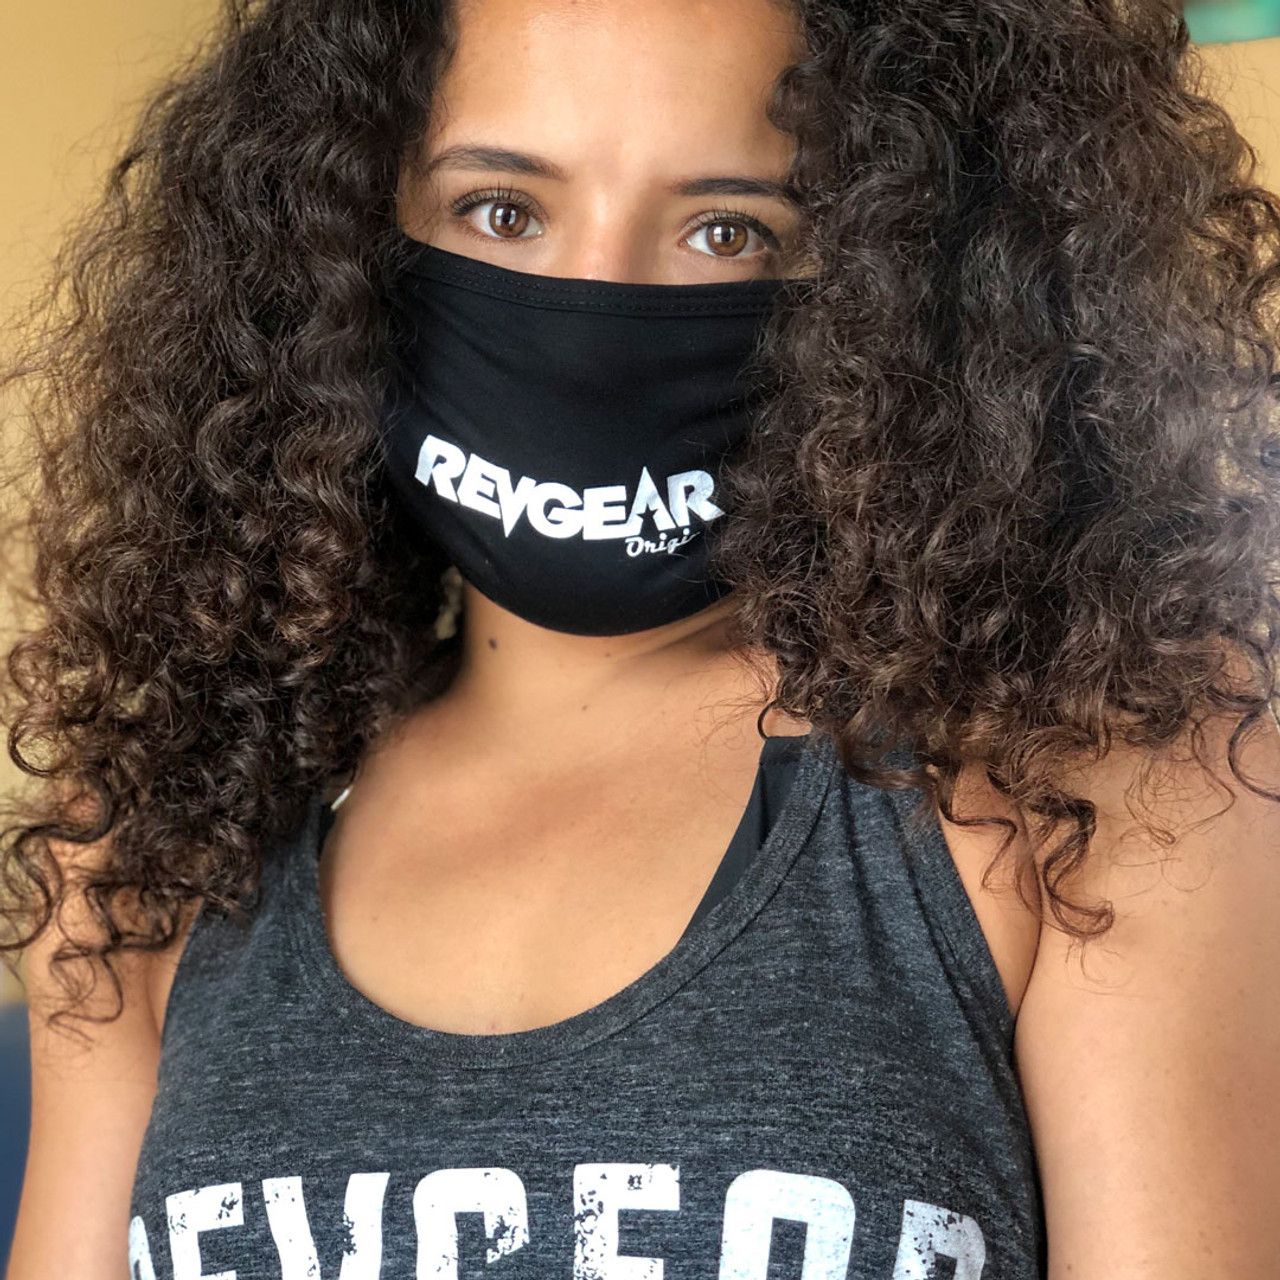 Revgear Face Mask